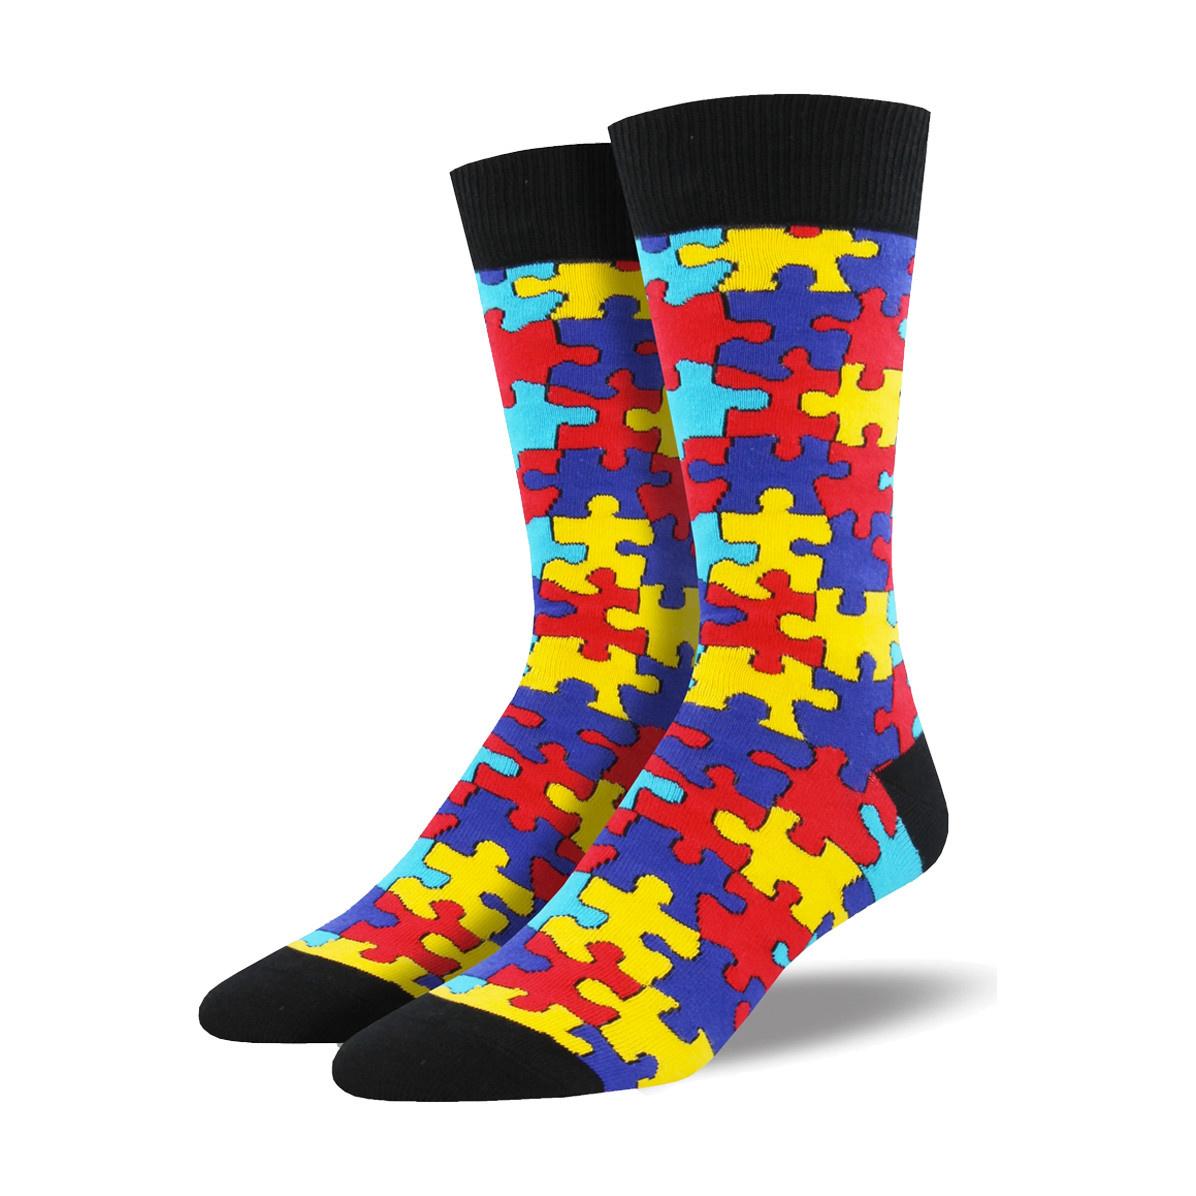 Socksmith Socksmith Men's Cotton Crew Socks Puzzled